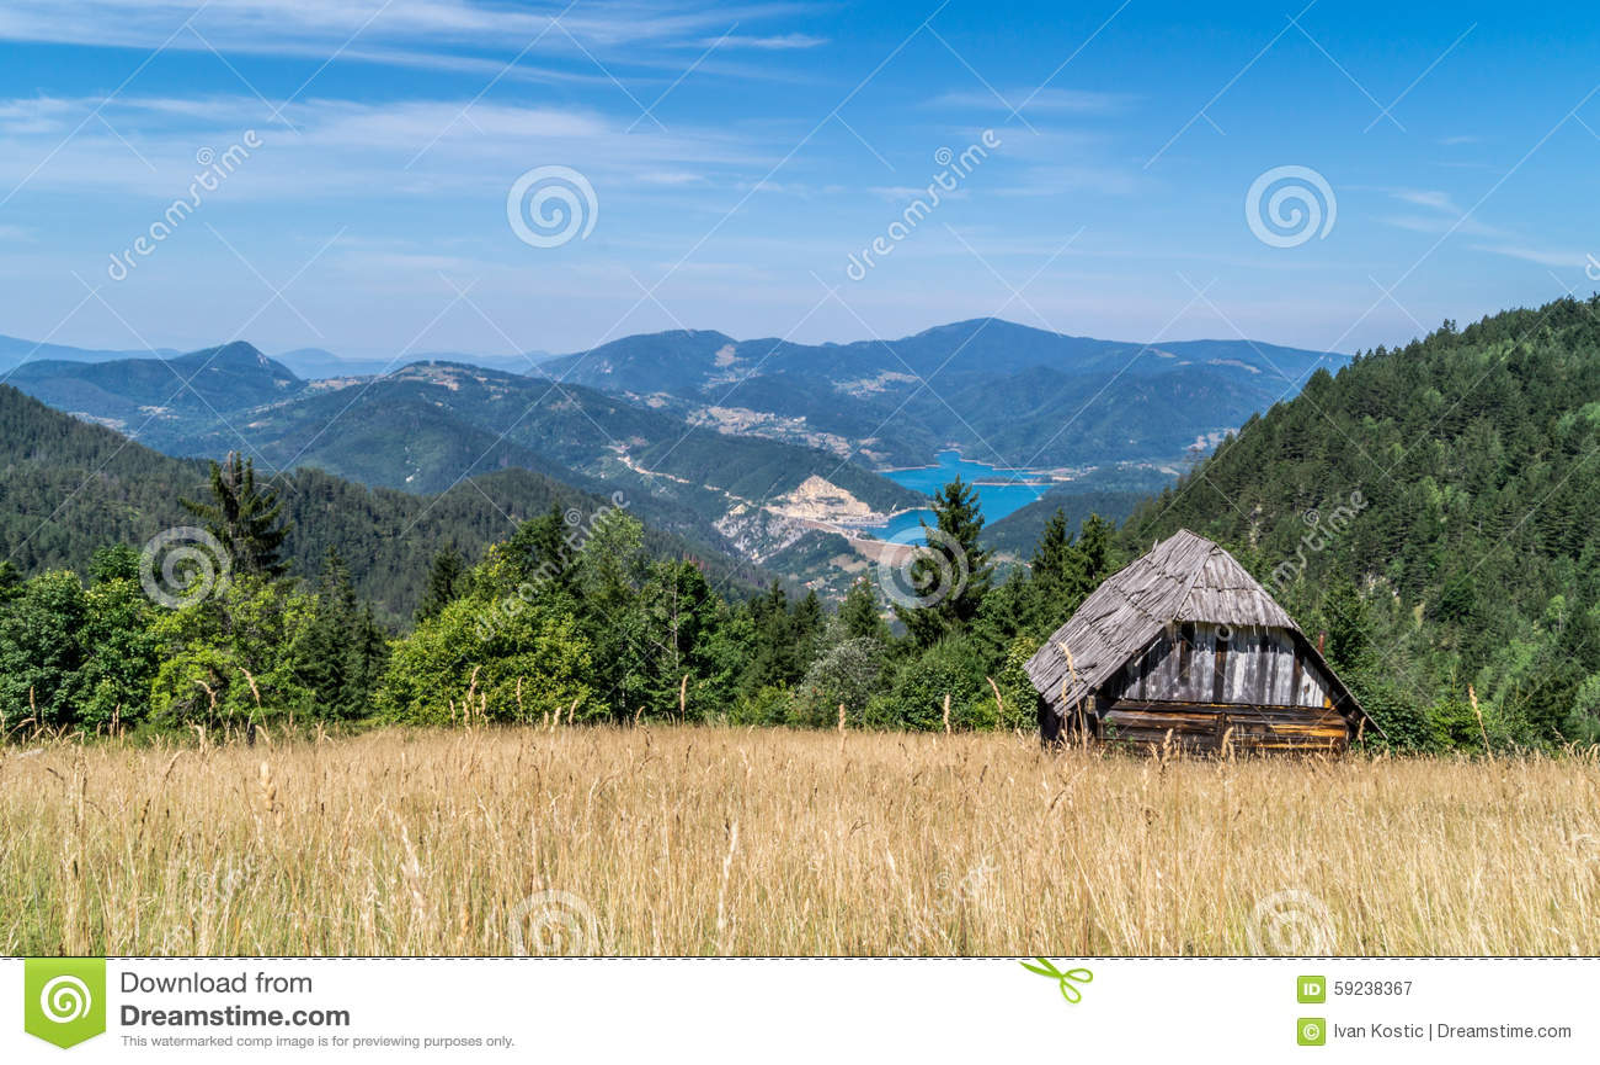 Log Cabin On Landscape Stock Photo Image 59238367